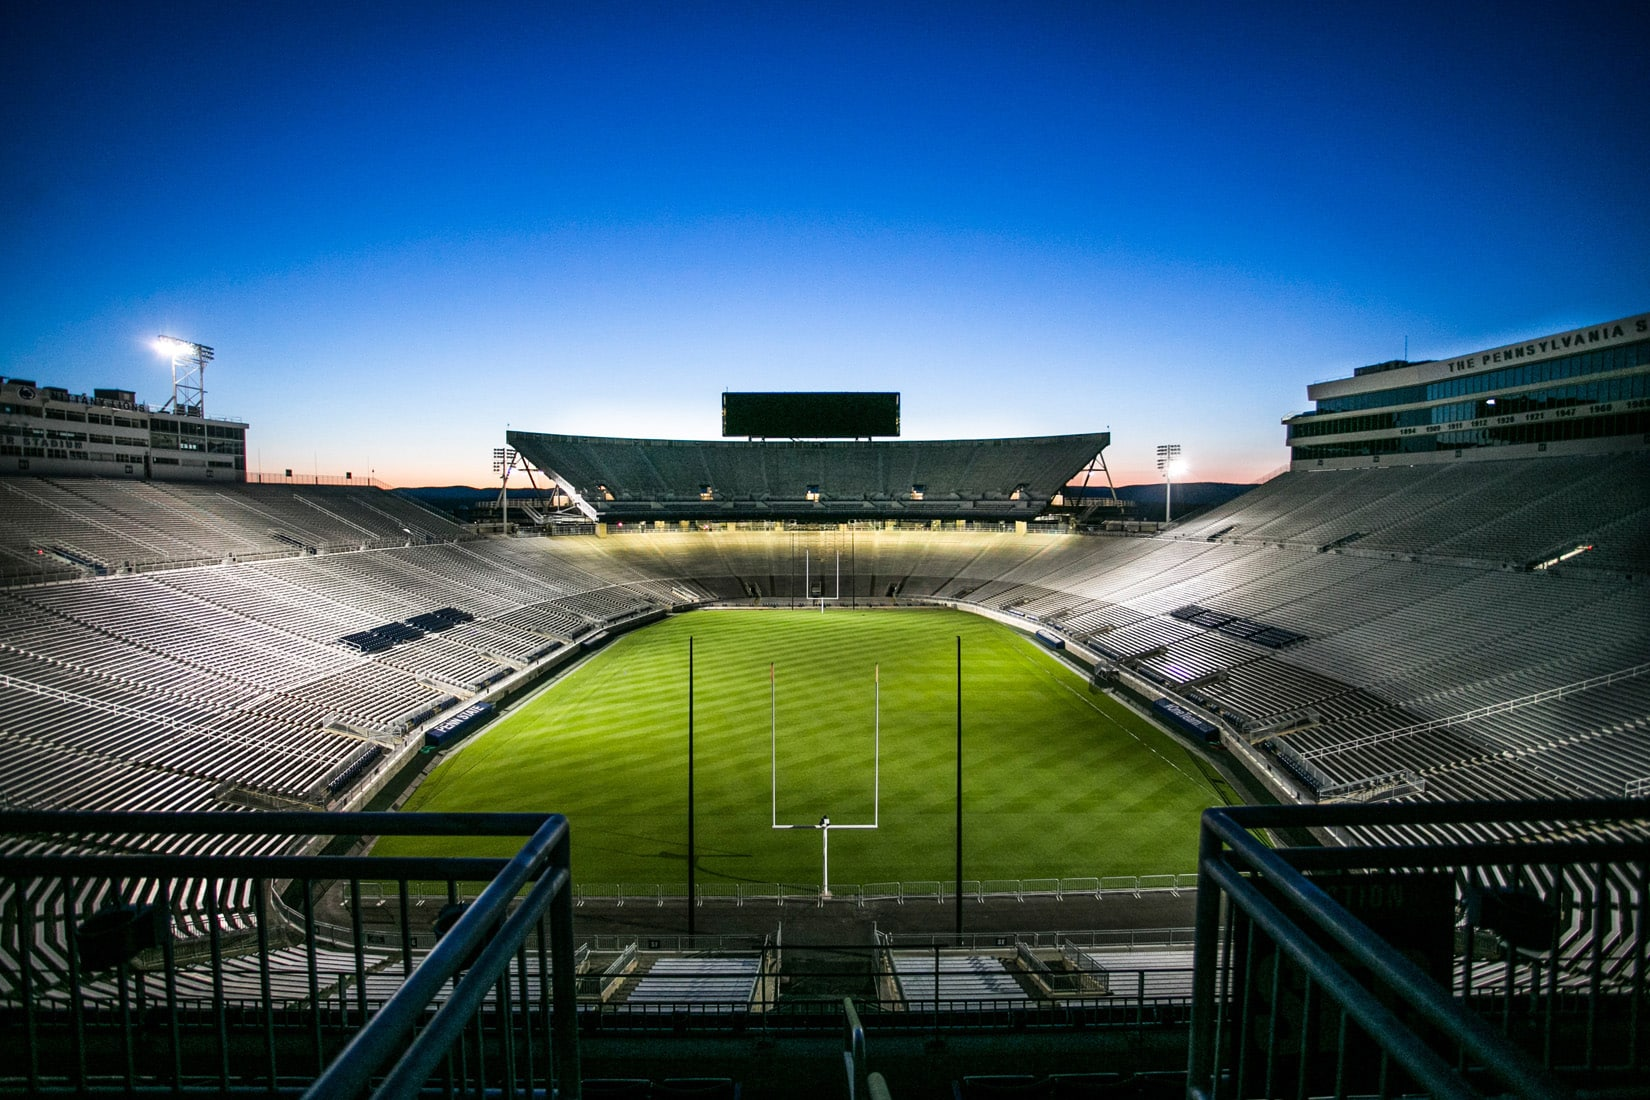 Sleeping Stadium, by Bob Lambert Photography (Penn State, State College, PA)